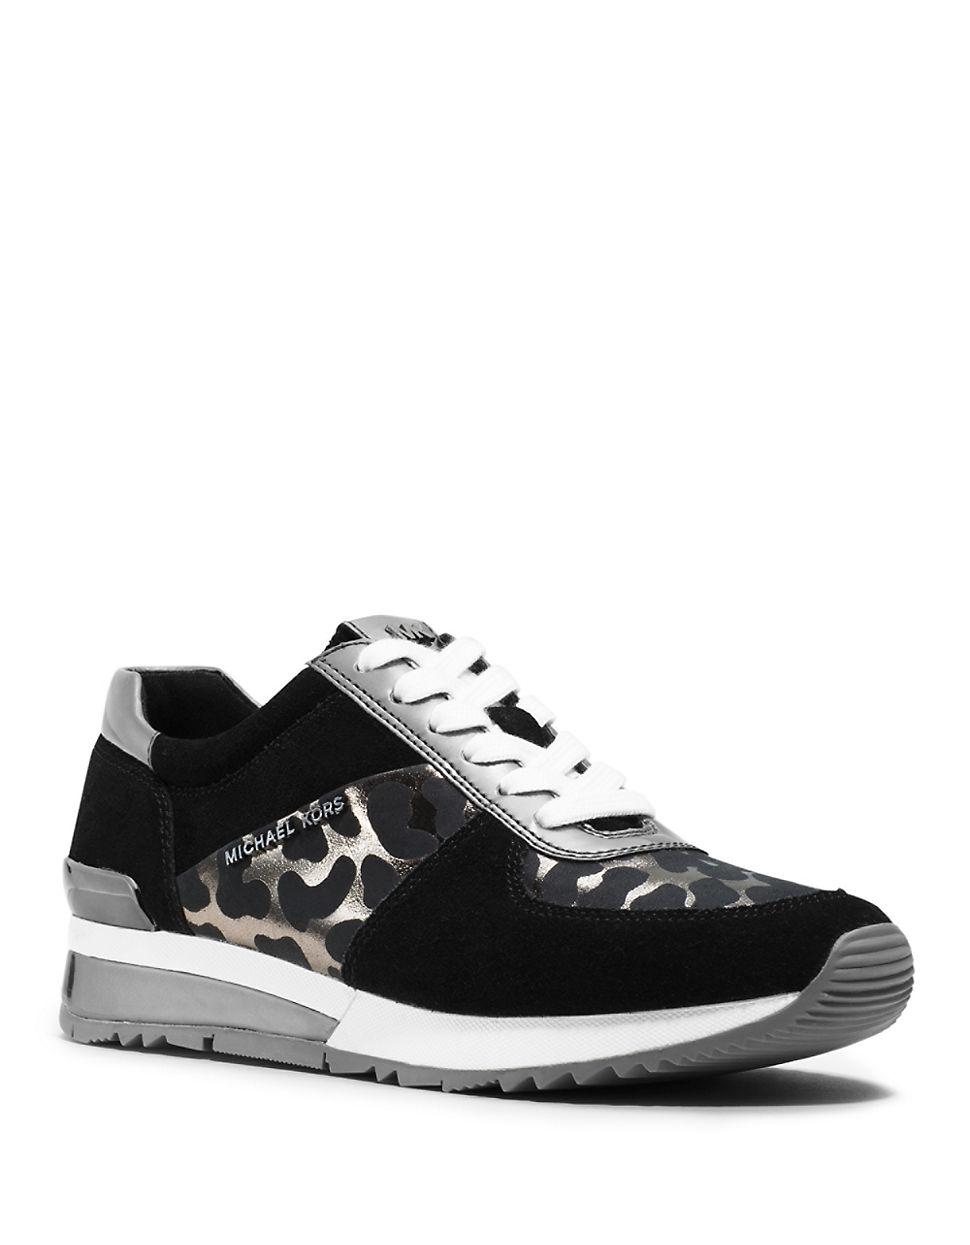 michael michael kors allie wrap trainer sneakers in black for men lyst. Black Bedroom Furniture Sets. Home Design Ideas